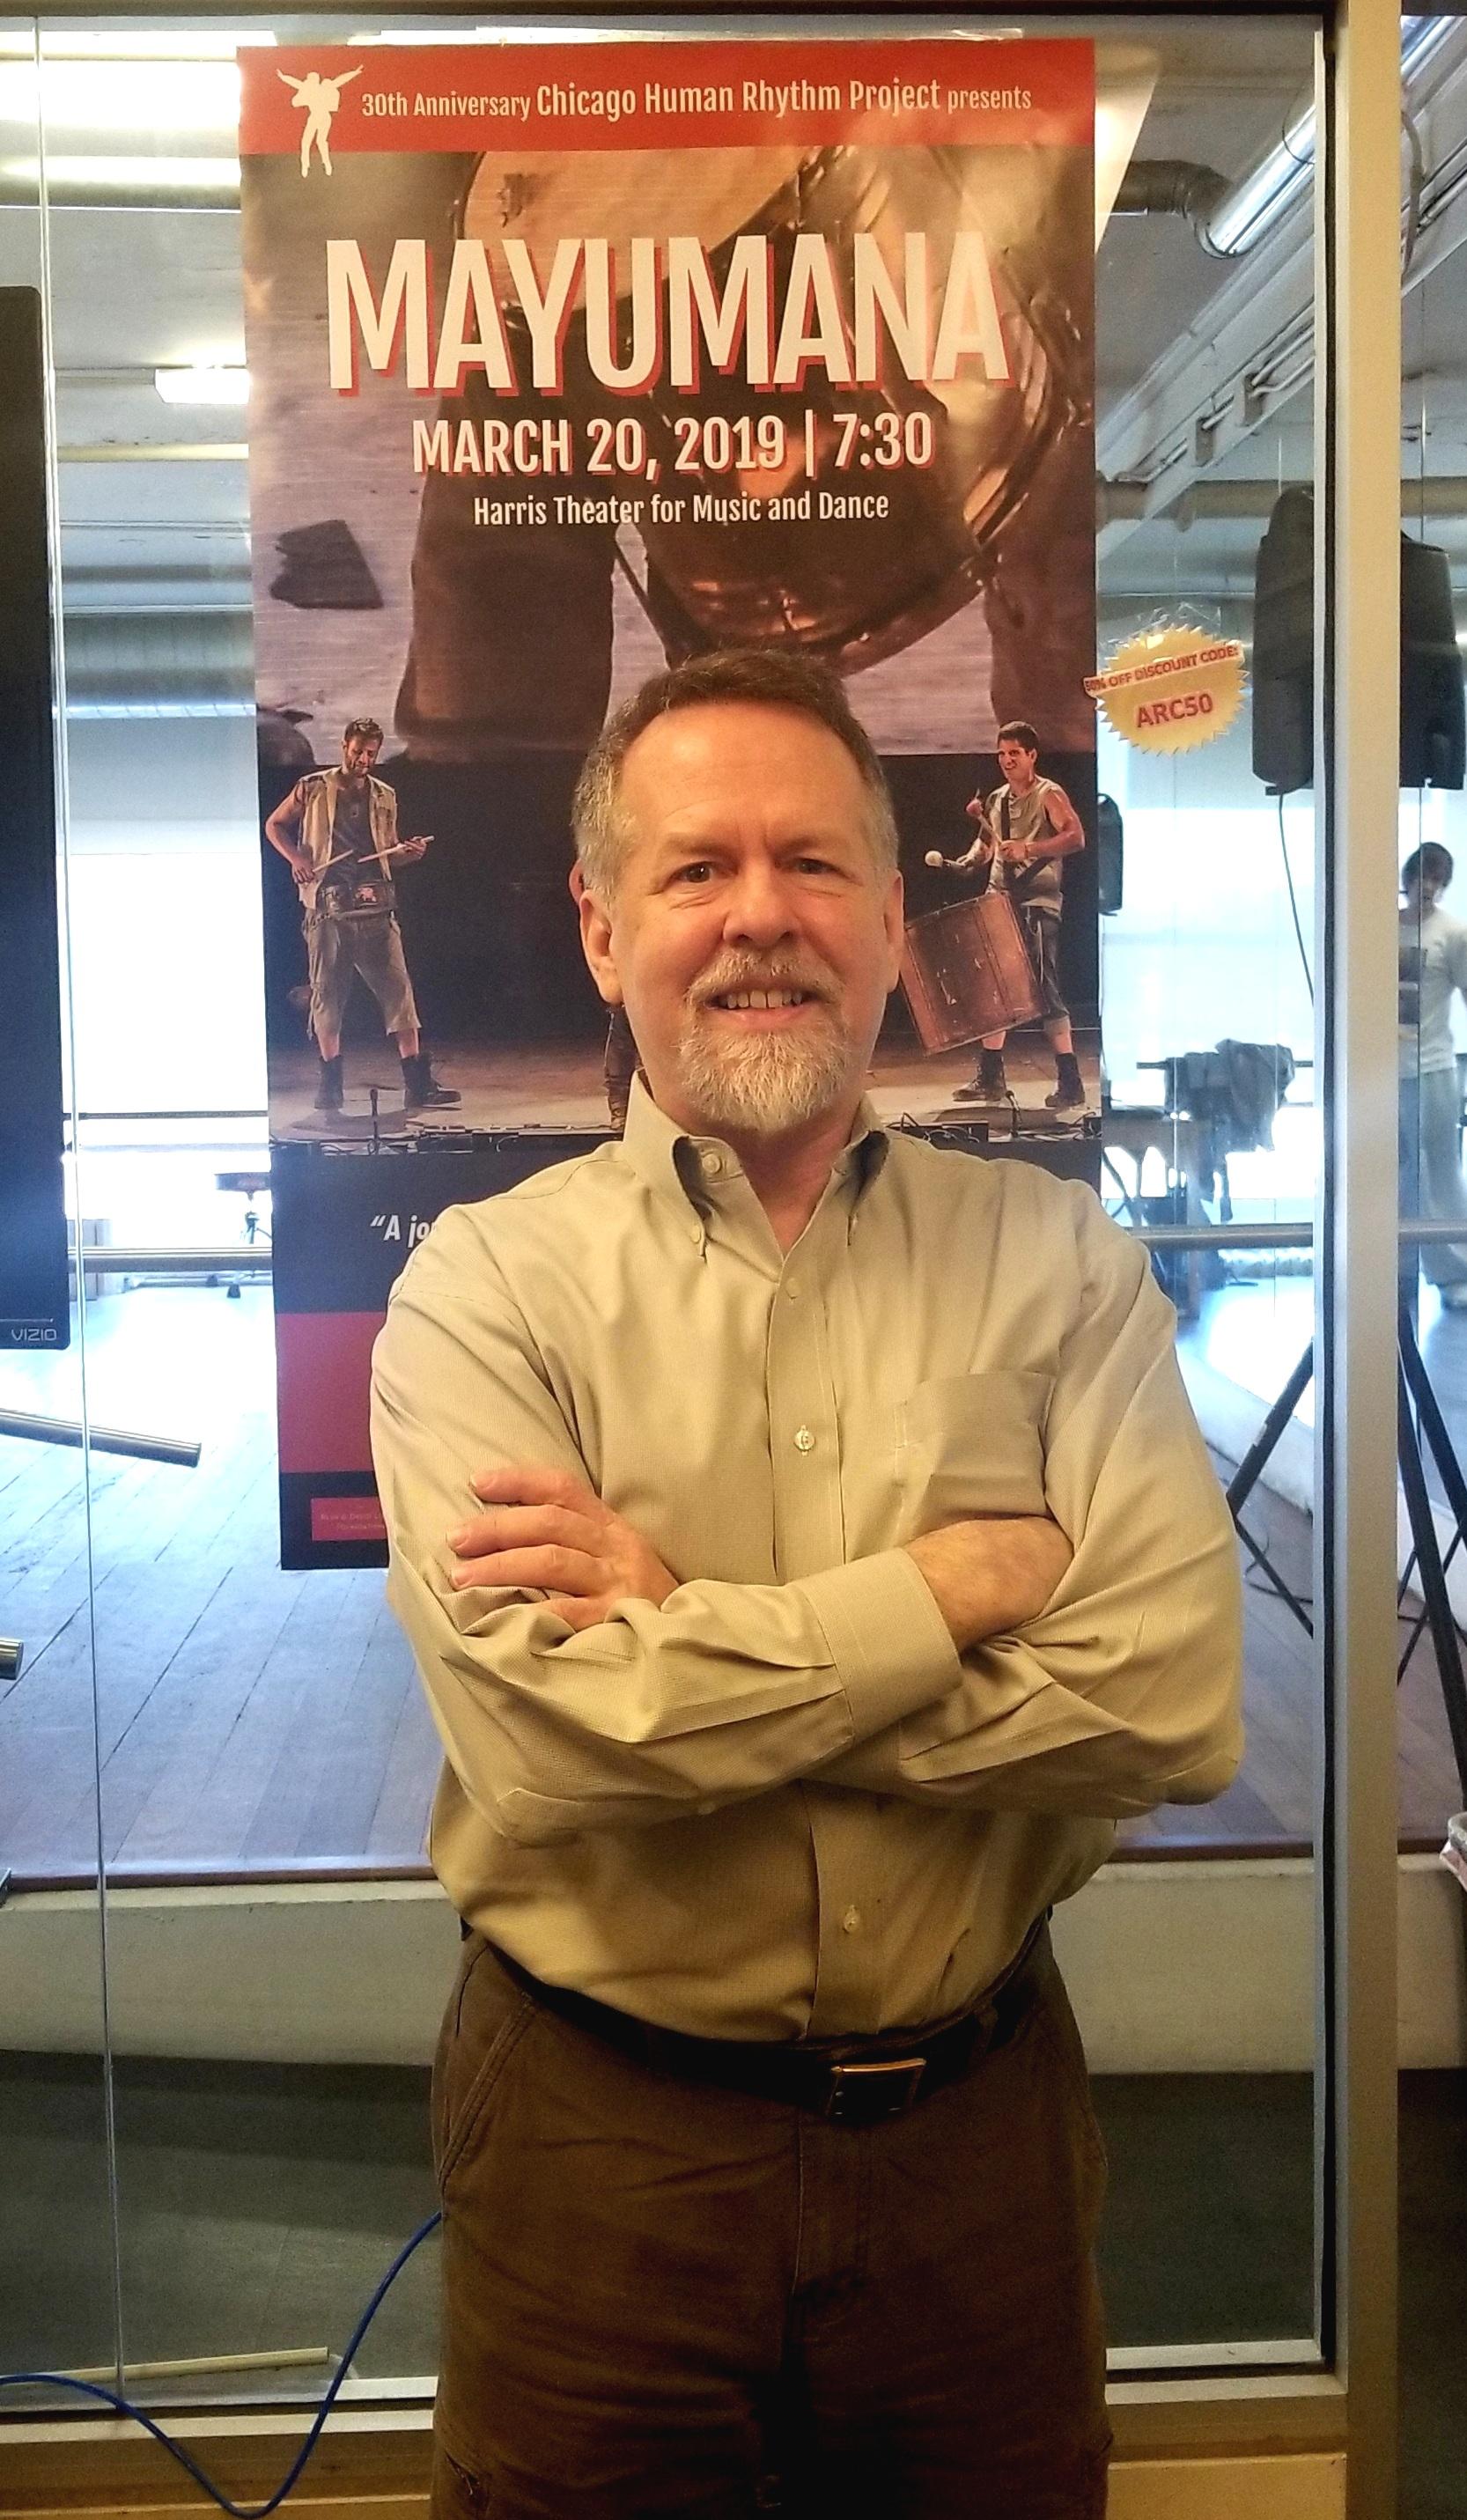 Lane Alexander, founder & director of Chicago Human Rhythm Project